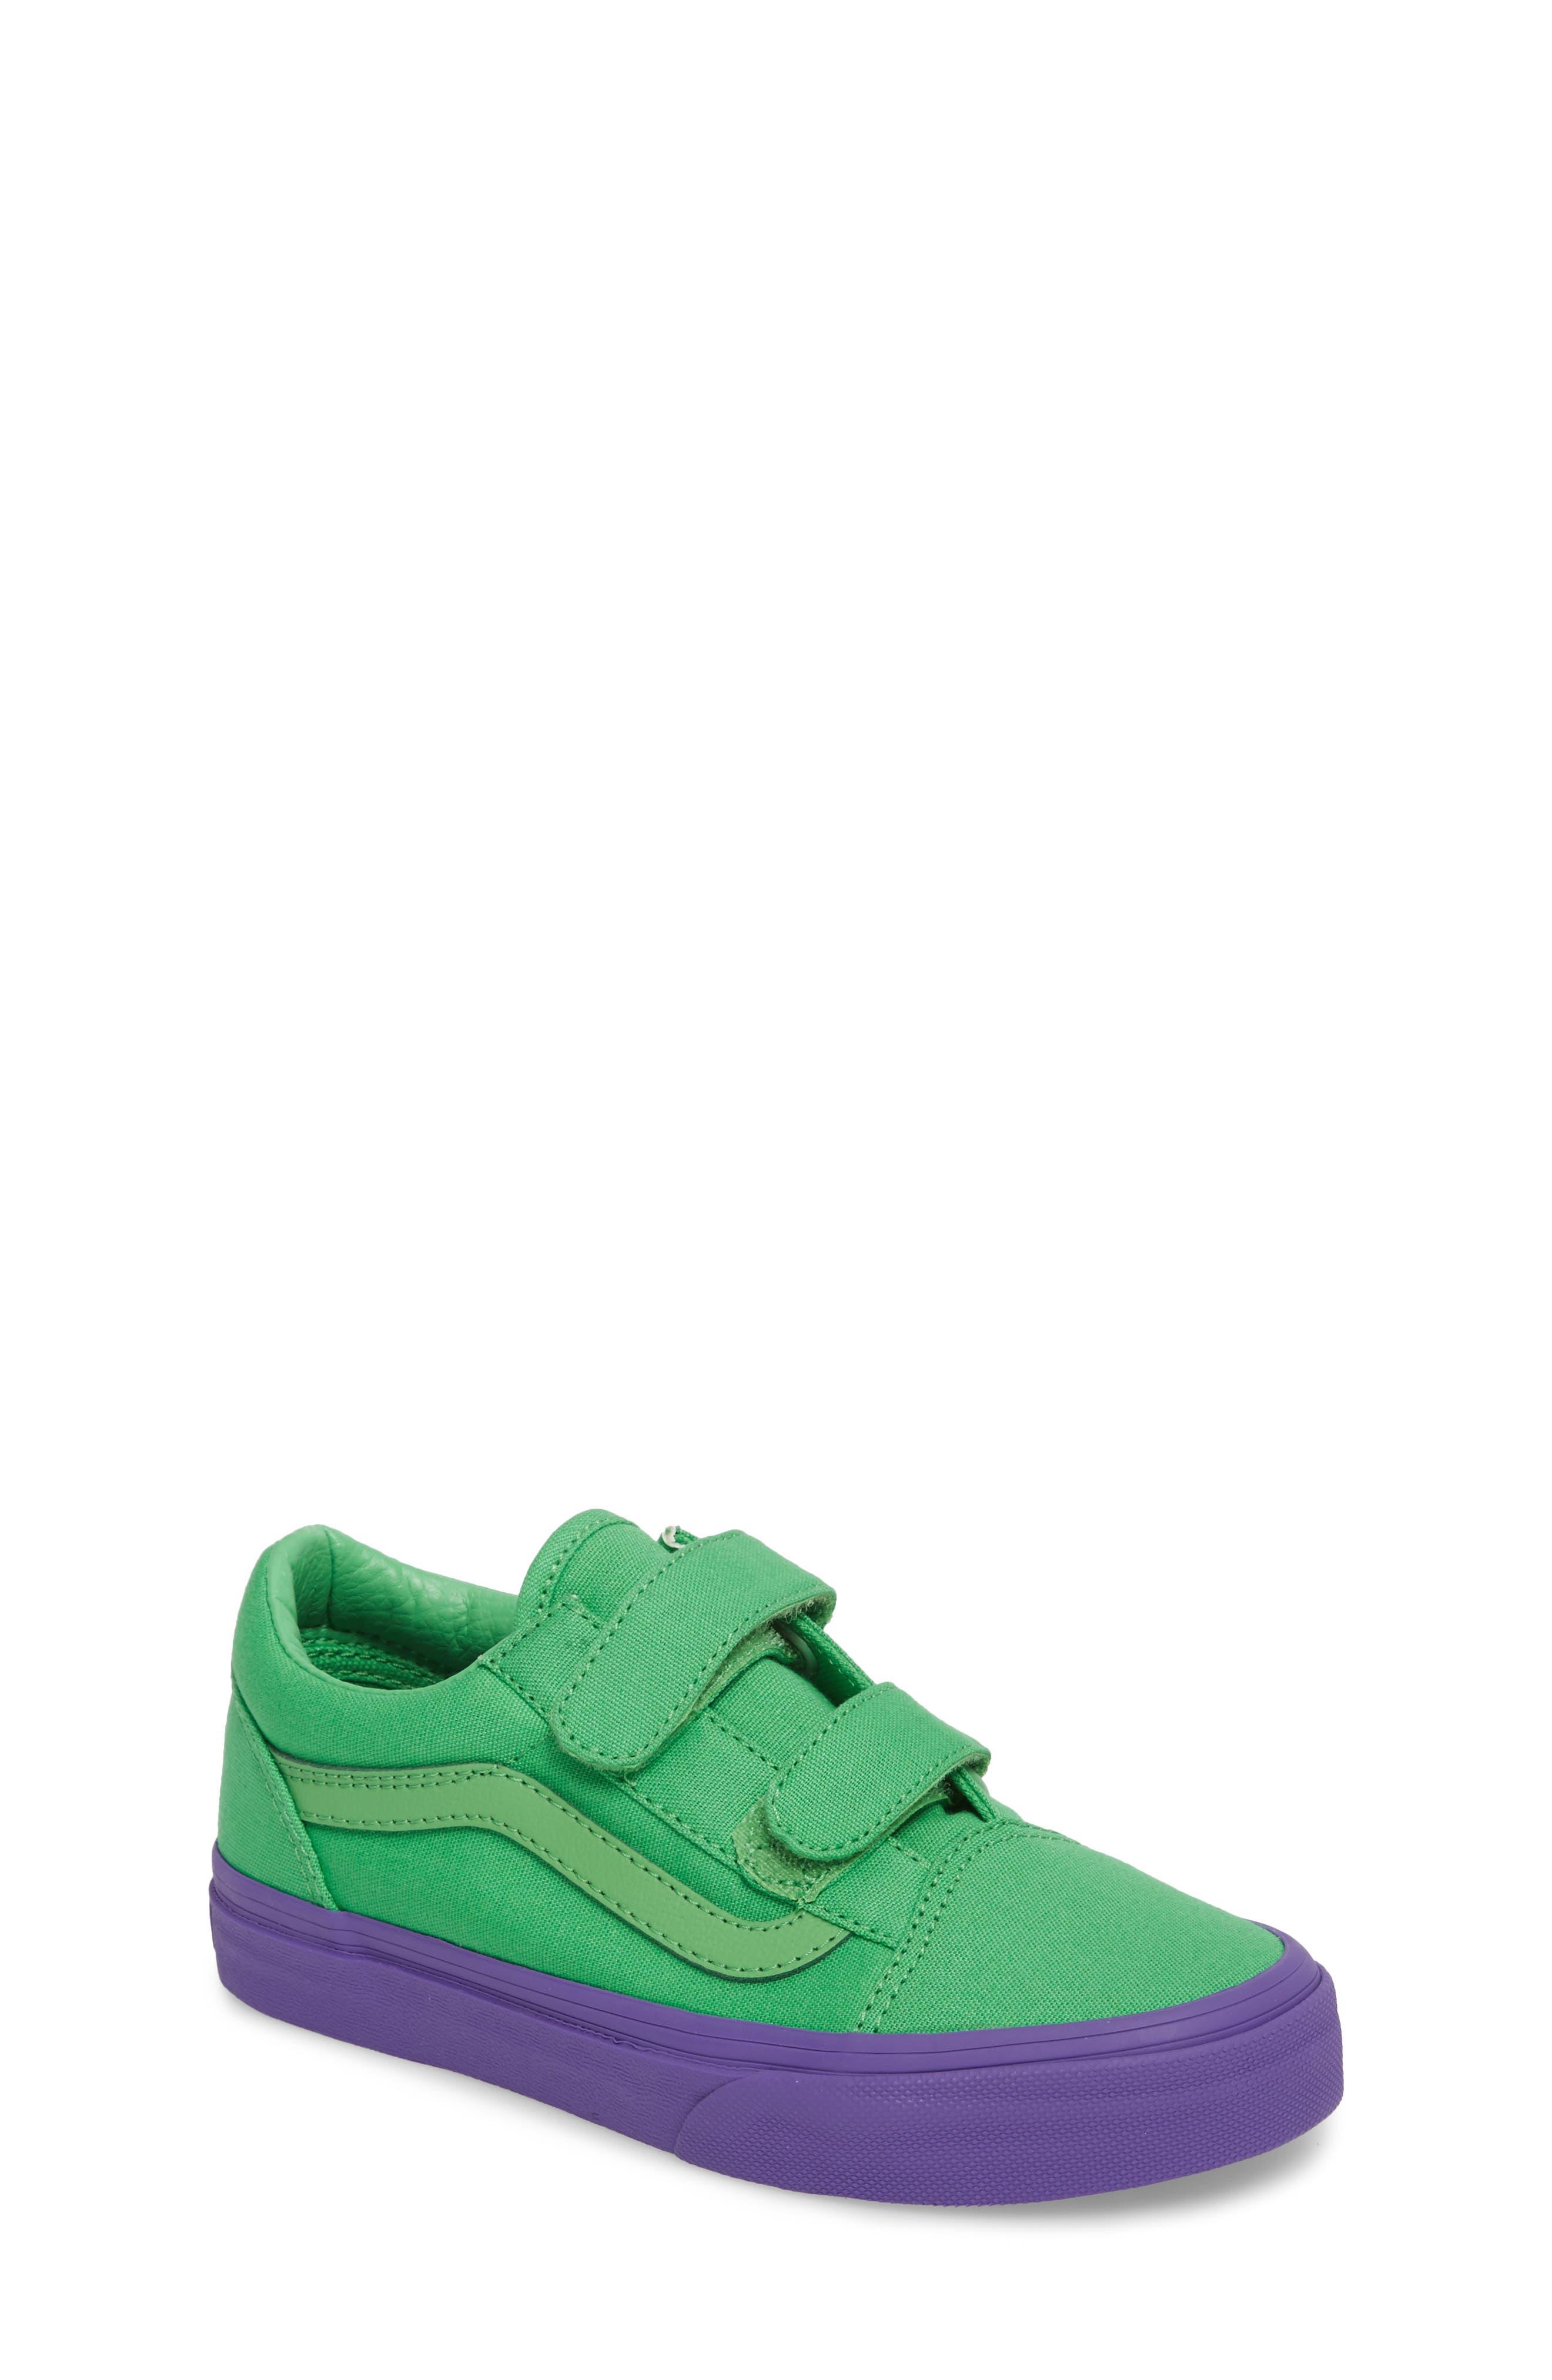 Old Skool V Sneaker,                         Main,                         color, Green/ Purple Cosplay